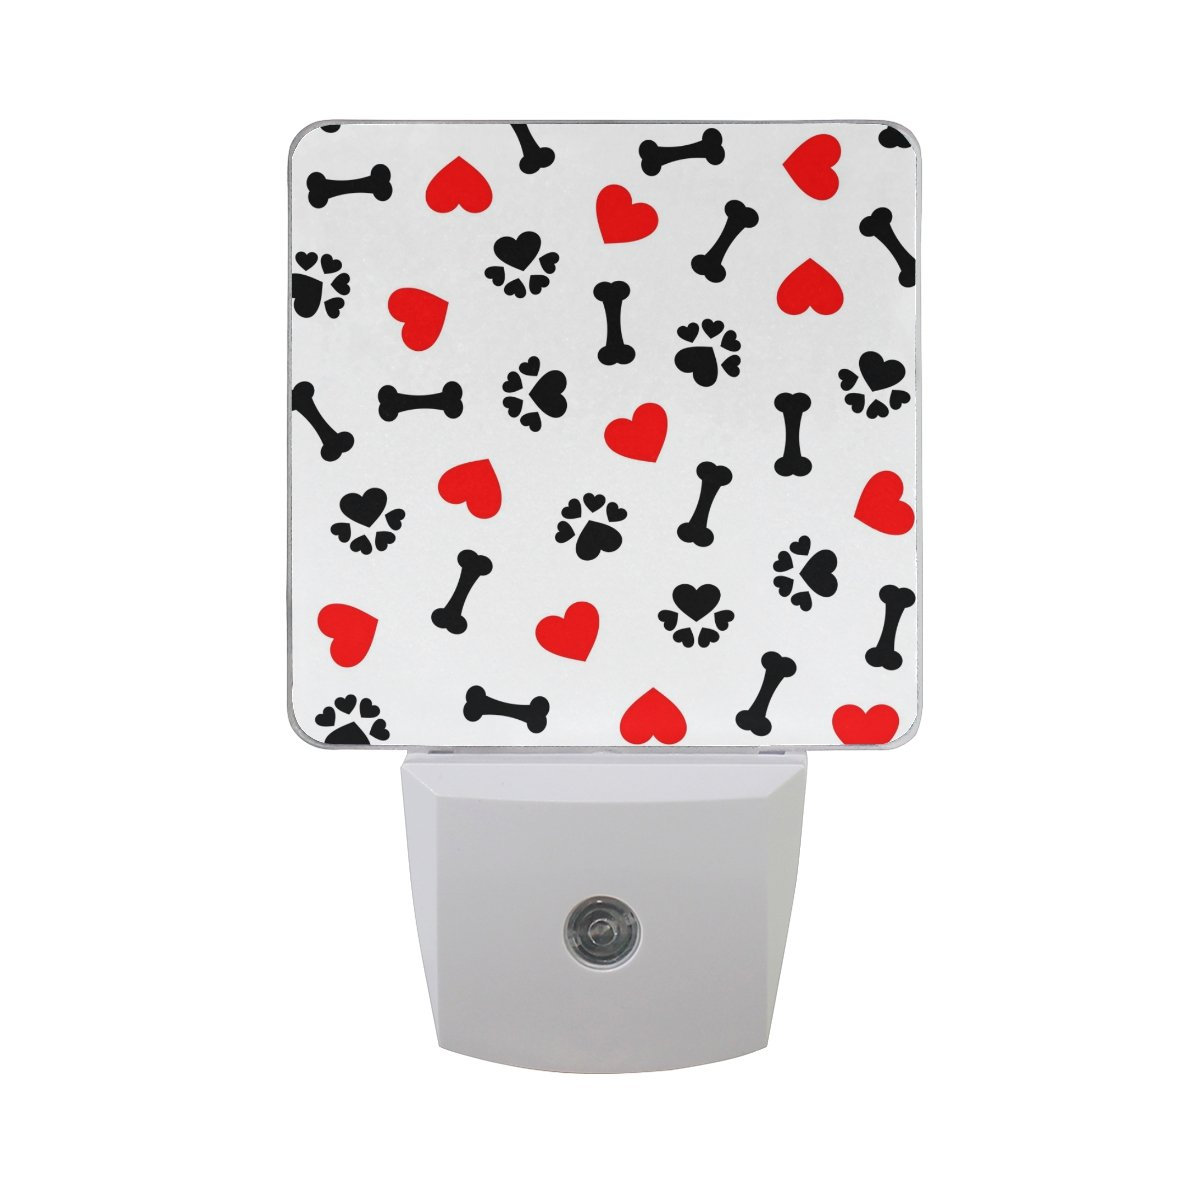 JOYPRINT Led Night Light Animal Dog Paw Print Bones Love Heart, Auto Senor Dusk to Dawn Night Light Plug in for Kids Baby Girls Boys Adults Room